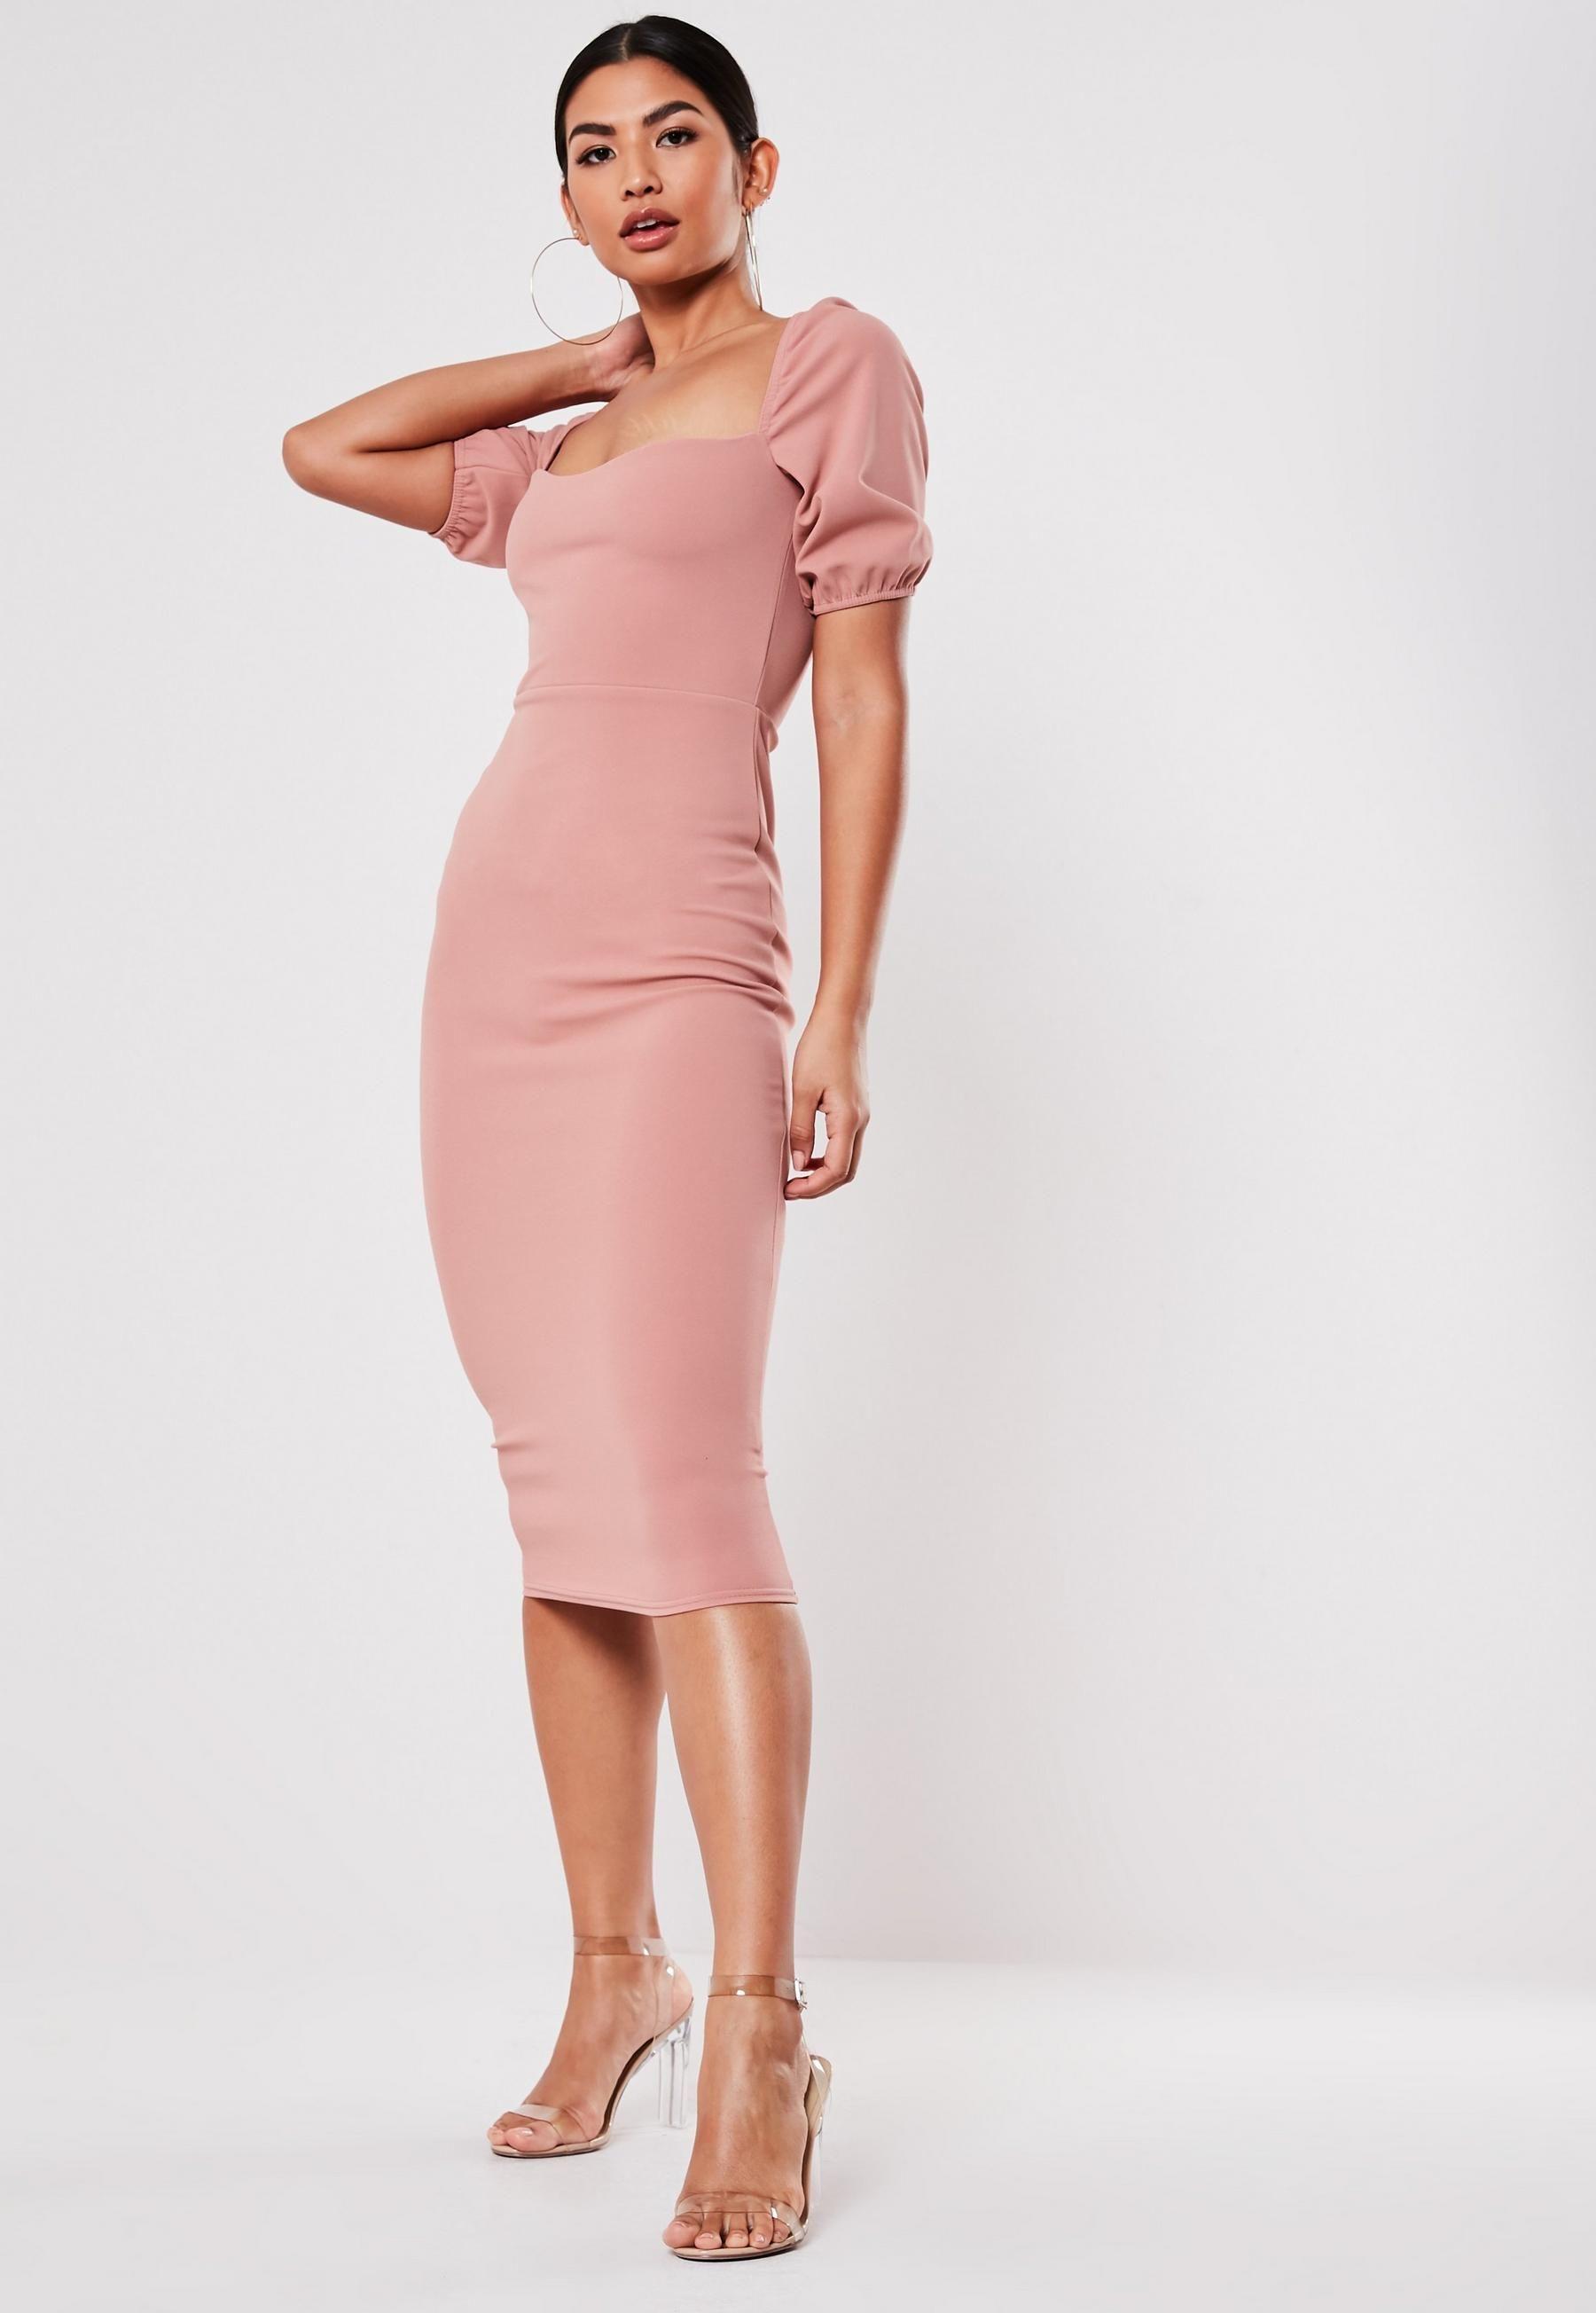 Rose Puff Sleeve Sweetheart Neck Midi Dress Missguided Trending Dresses Sweetheart Neck Midi Dress Dresses [ 2608 x 1800 Pixel ]